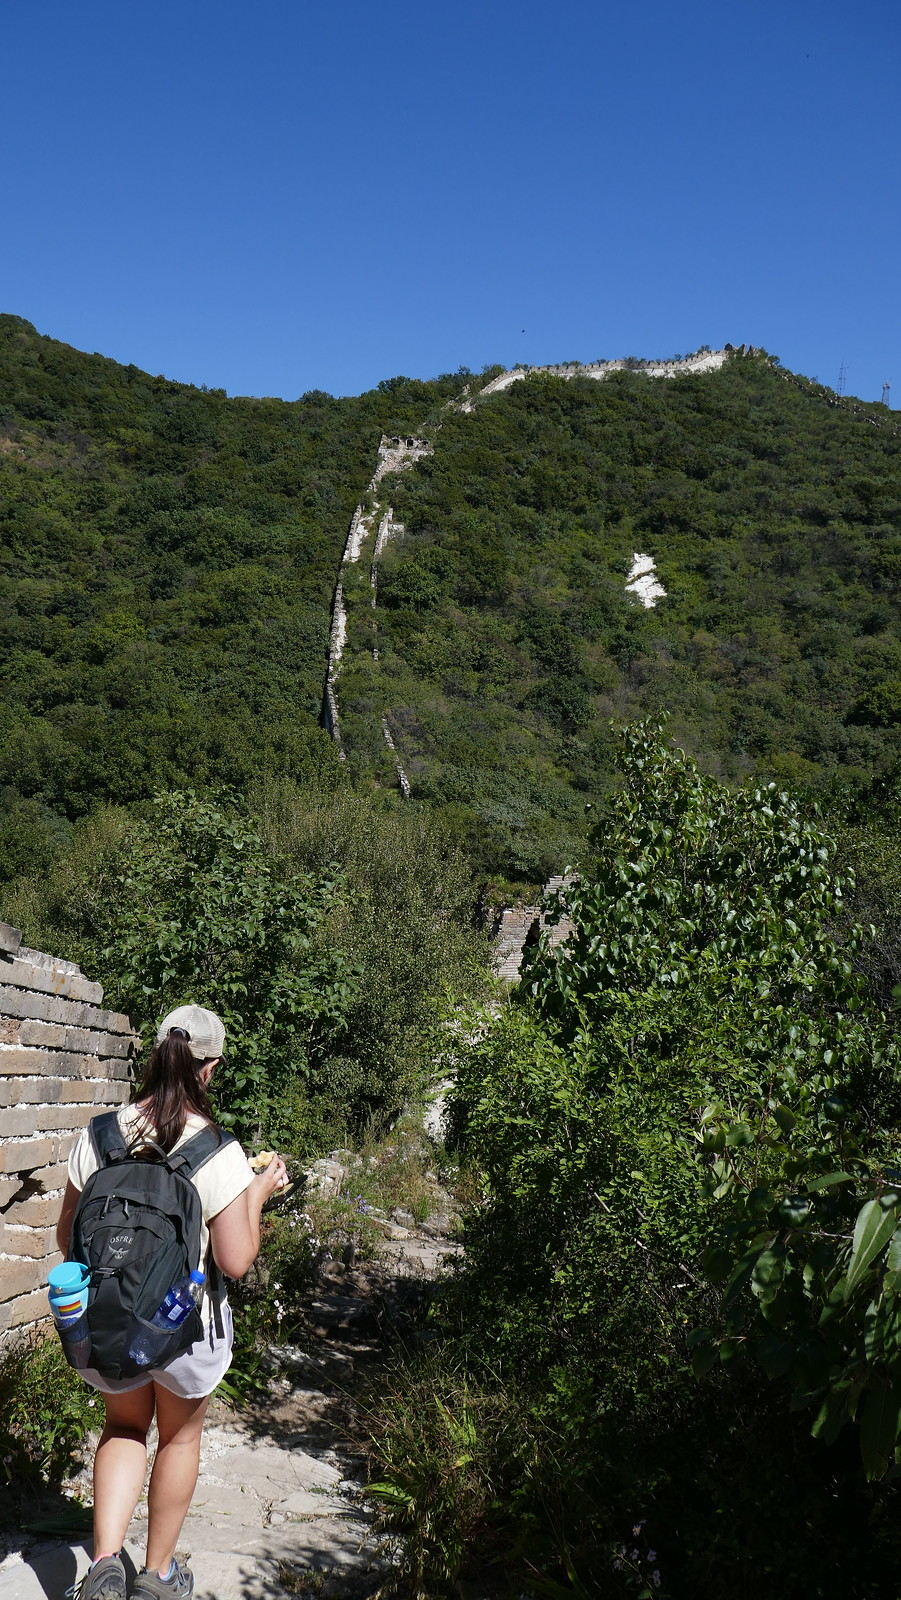 La Gran Muralla totalmente inmersa en la naturaleza